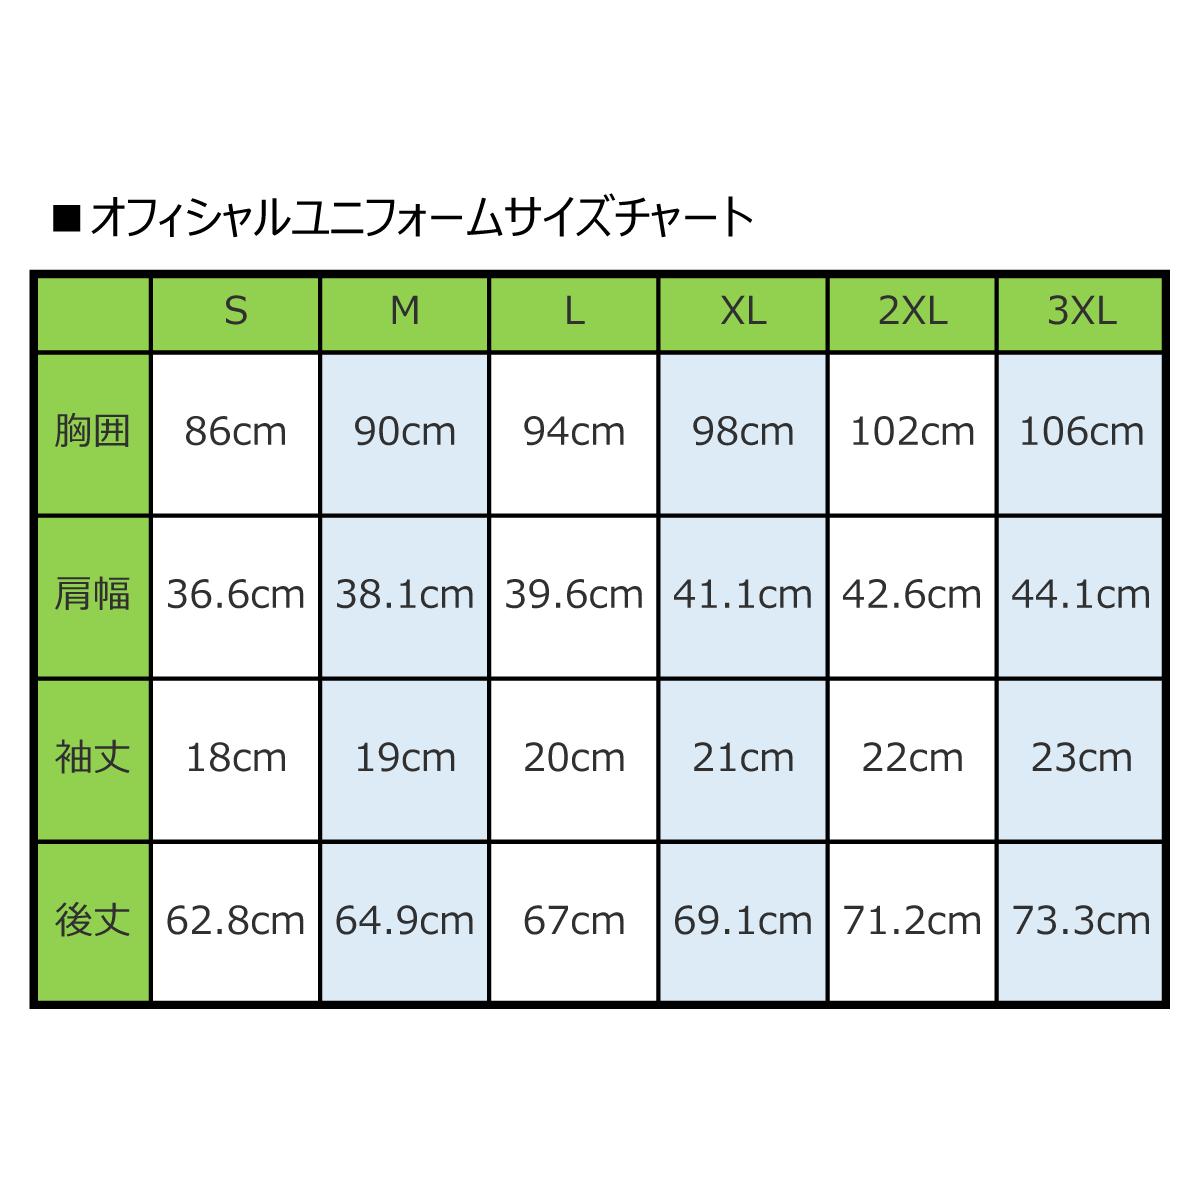 JTサンダーズ広島 オフィシャルユニフォーム/3rd